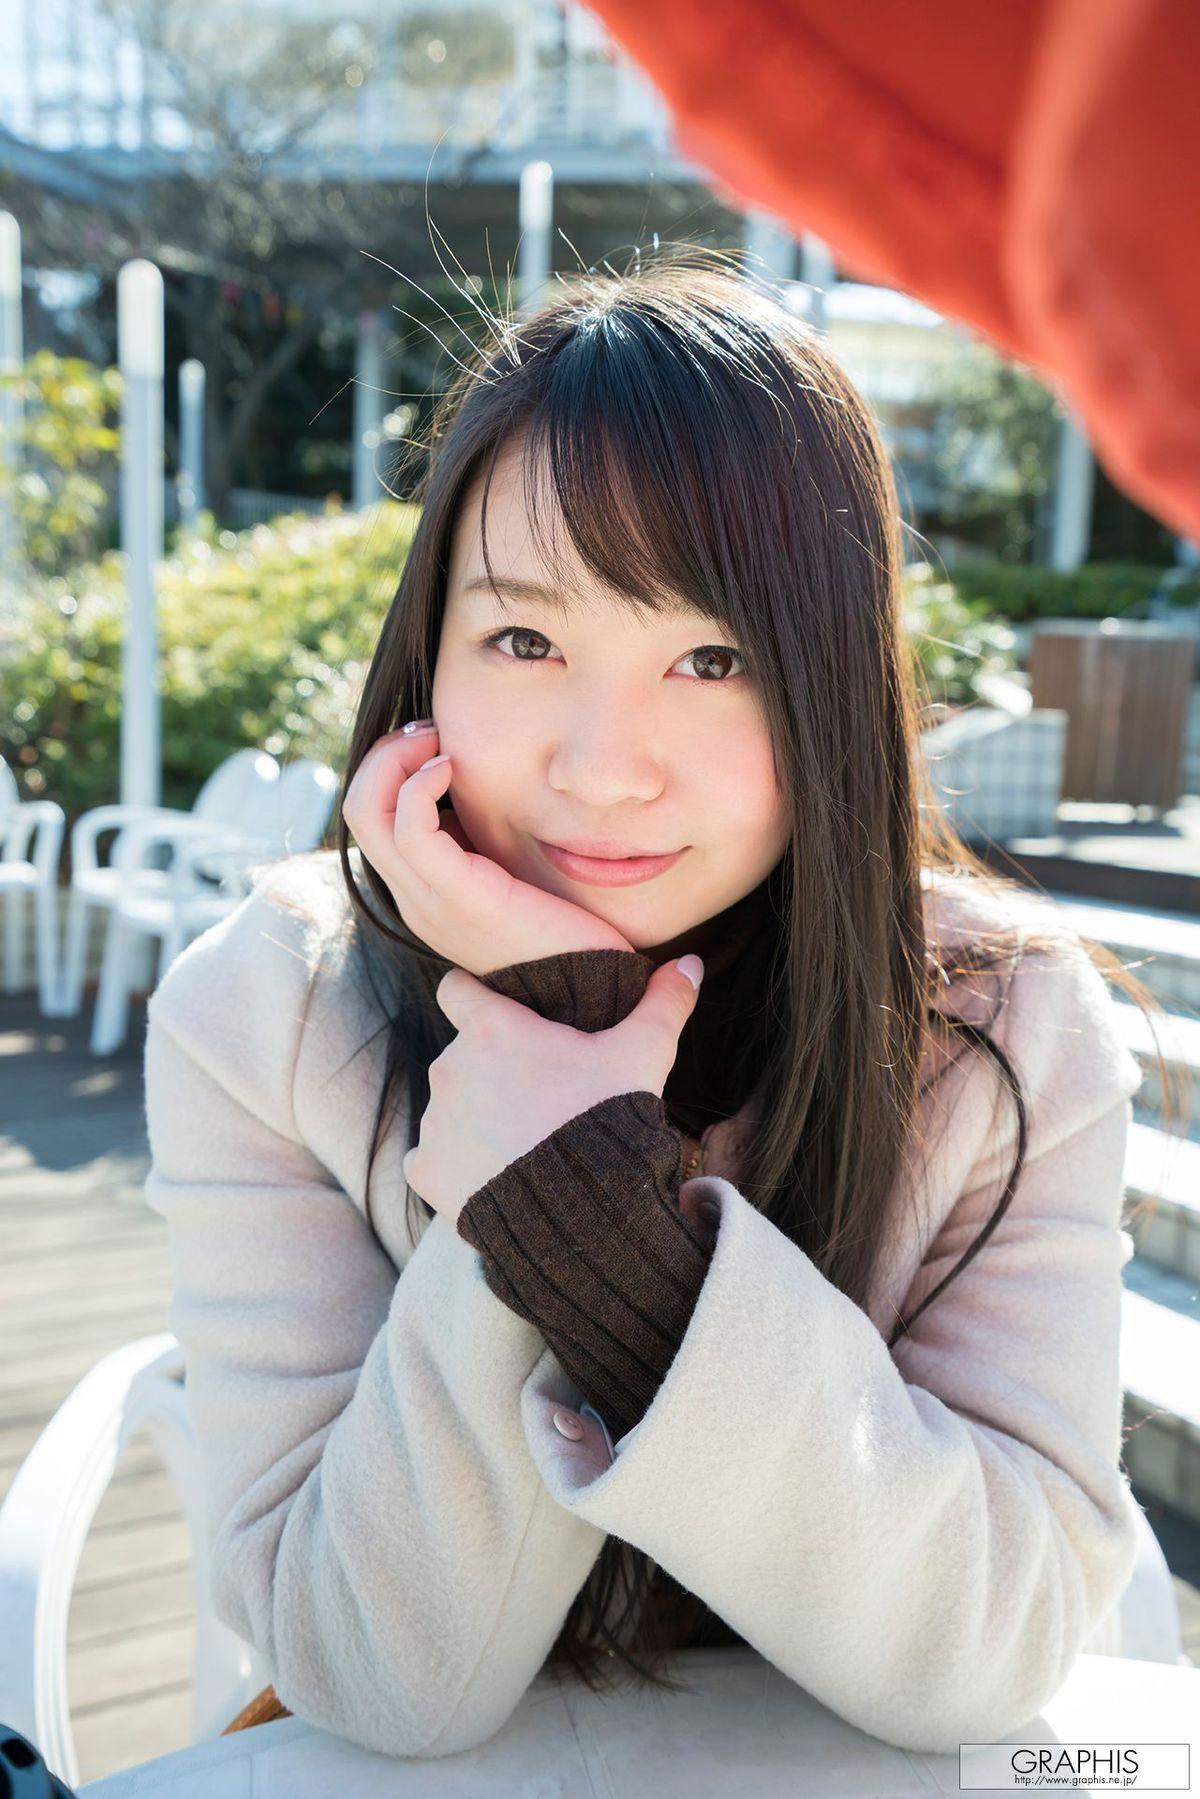 eyval.net: ゆめの あいか, 夢乃あいか, Aika Yumeno - Graphis Gals No.341